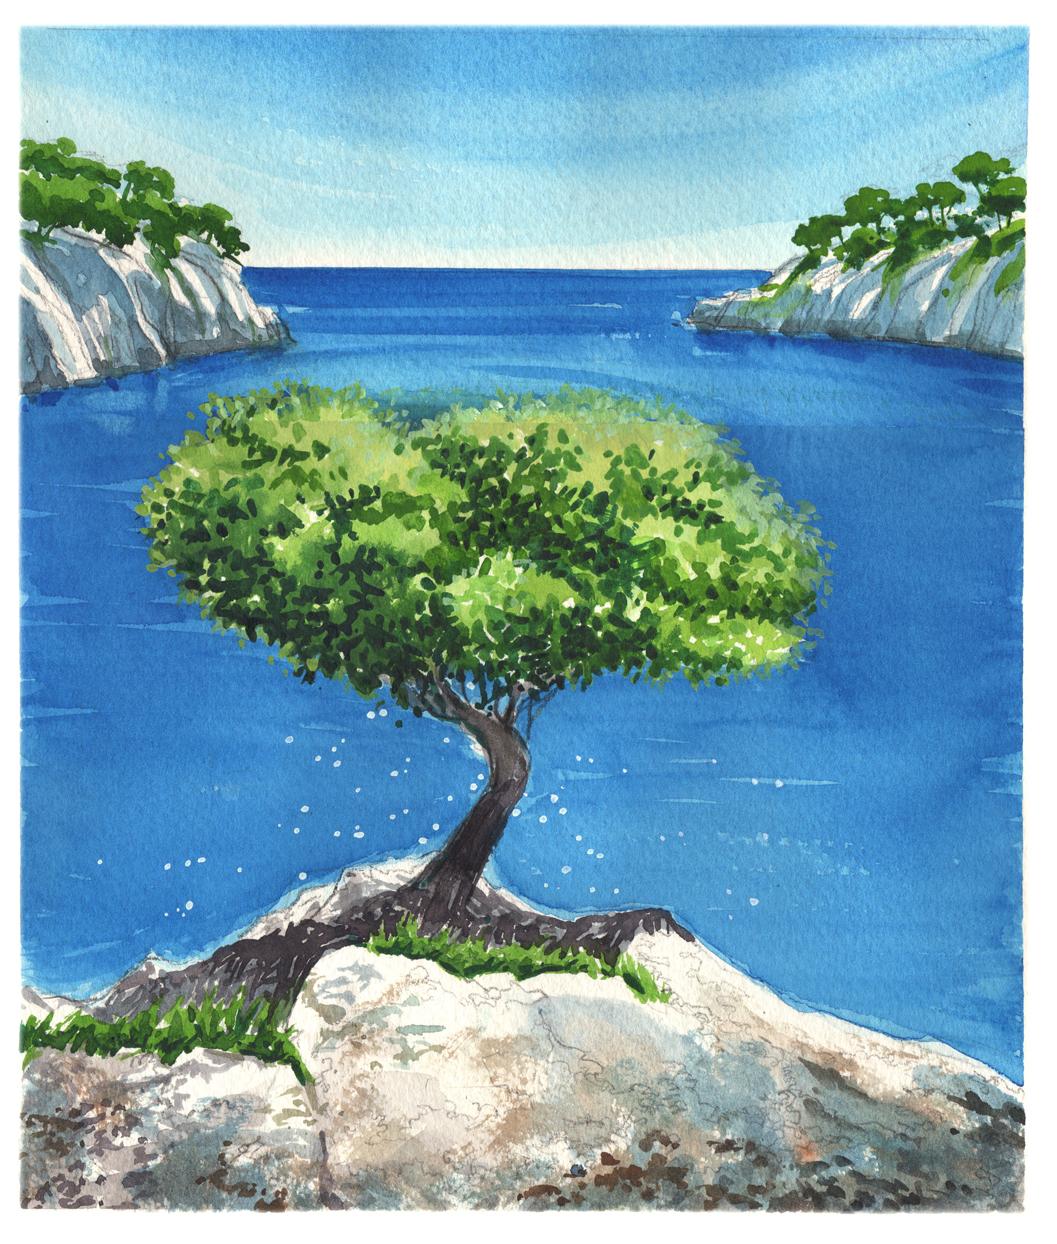 Mediterranean pine simon roberts painting in france